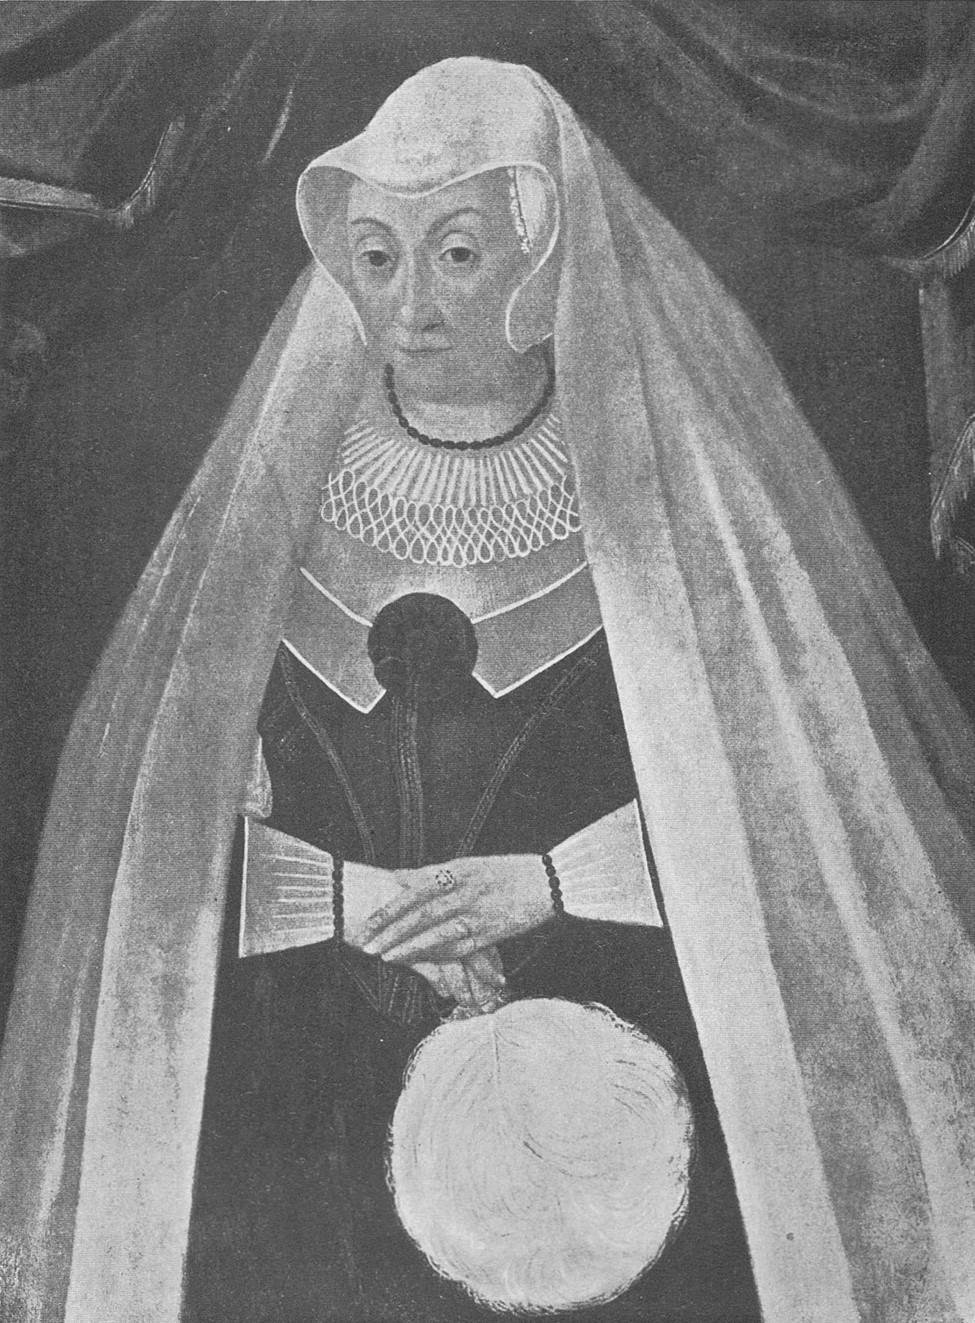 Portrait of Kristina Sture at Gripsholm castle. Unknown artist, 1600's. Source: Svenskt Porträttarkiv (CC-BY-NC-SA 4.0)